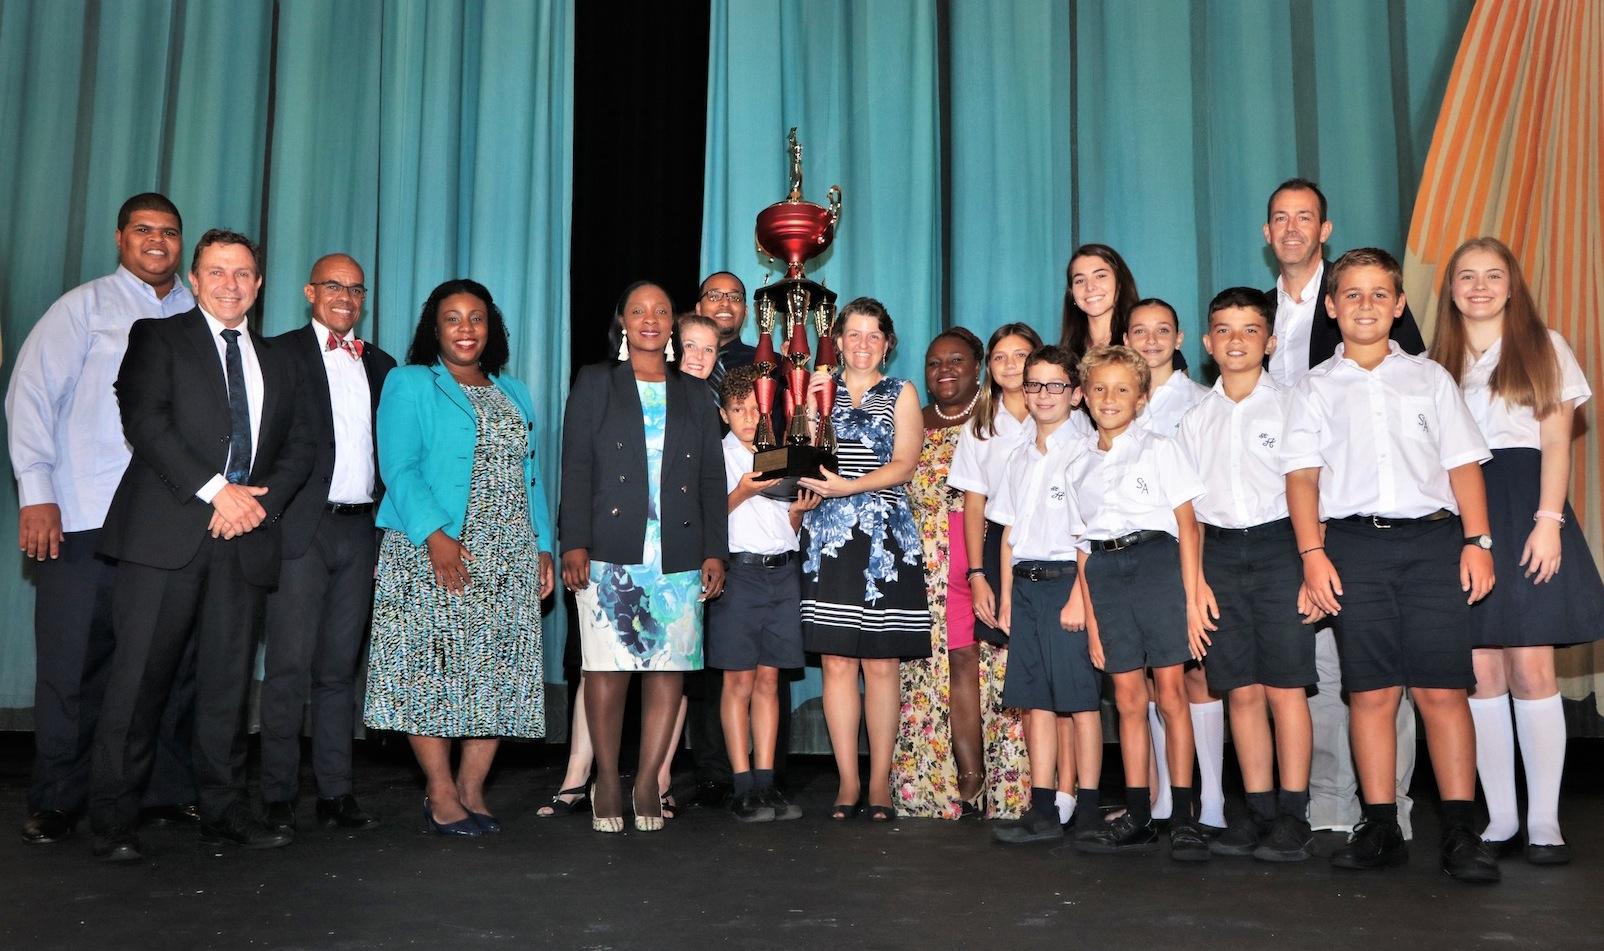 St. Andrew's International School wins top National Arts Festival Award